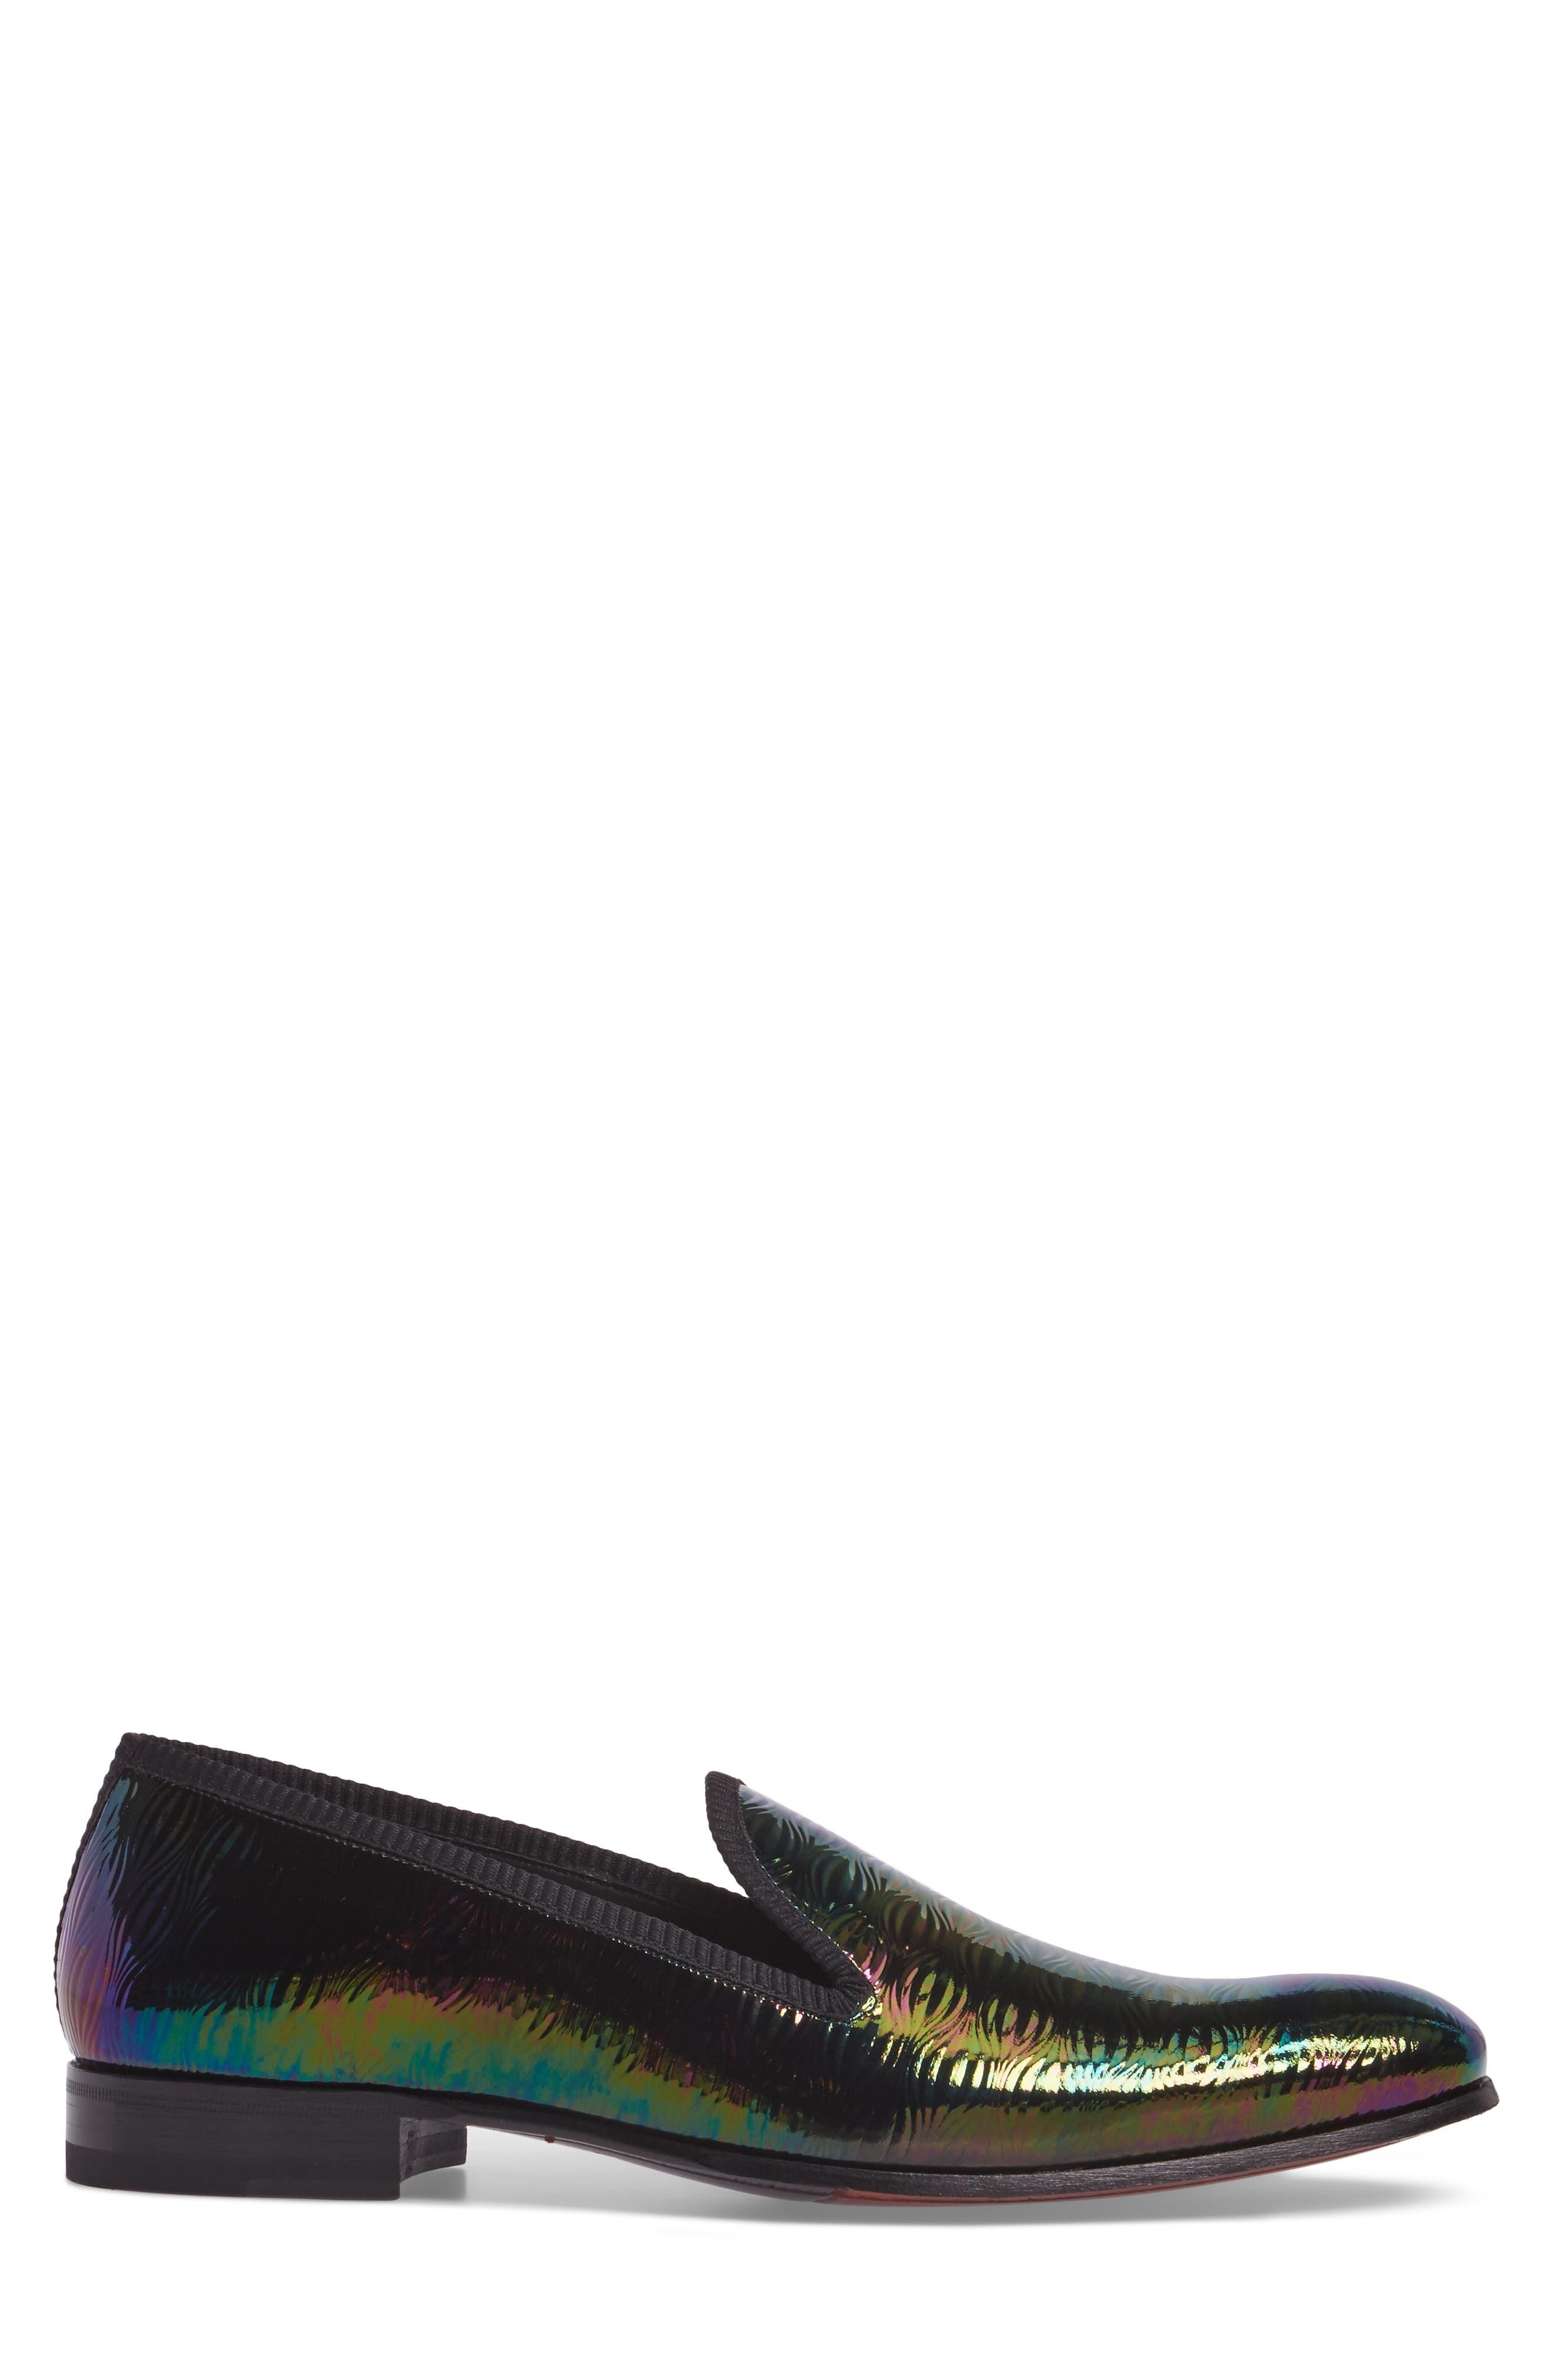 Alternate Image 3  - Mezlan Duque Venetian Loafer (Men)